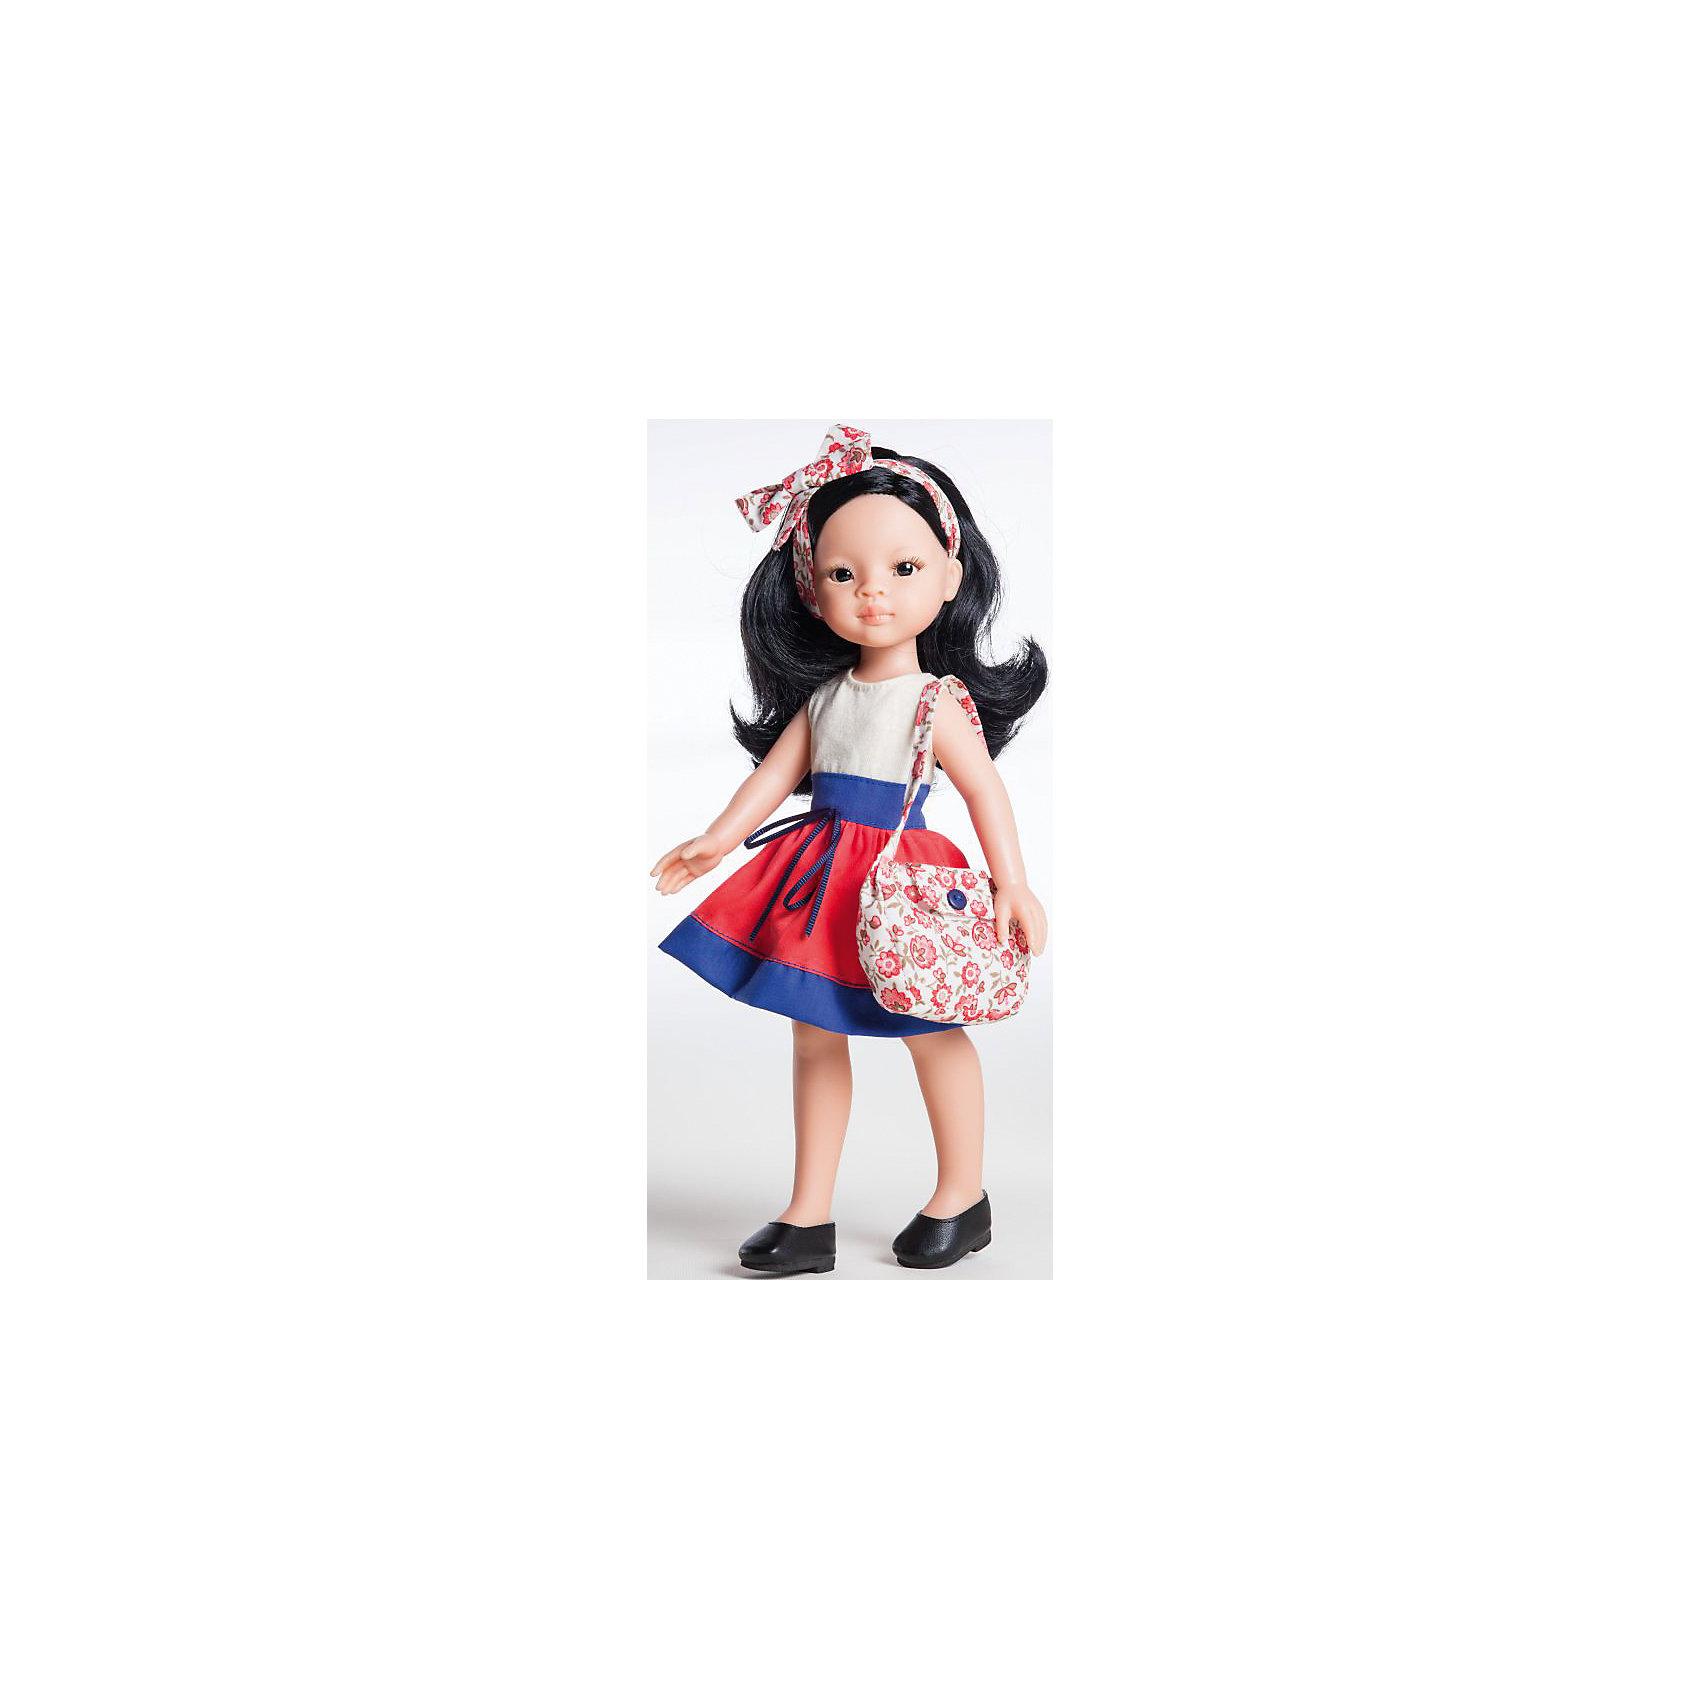 Paola Reina Кукла Лиу, 32 см, Paola Reina paola reina горди без одежды 34 см 34021